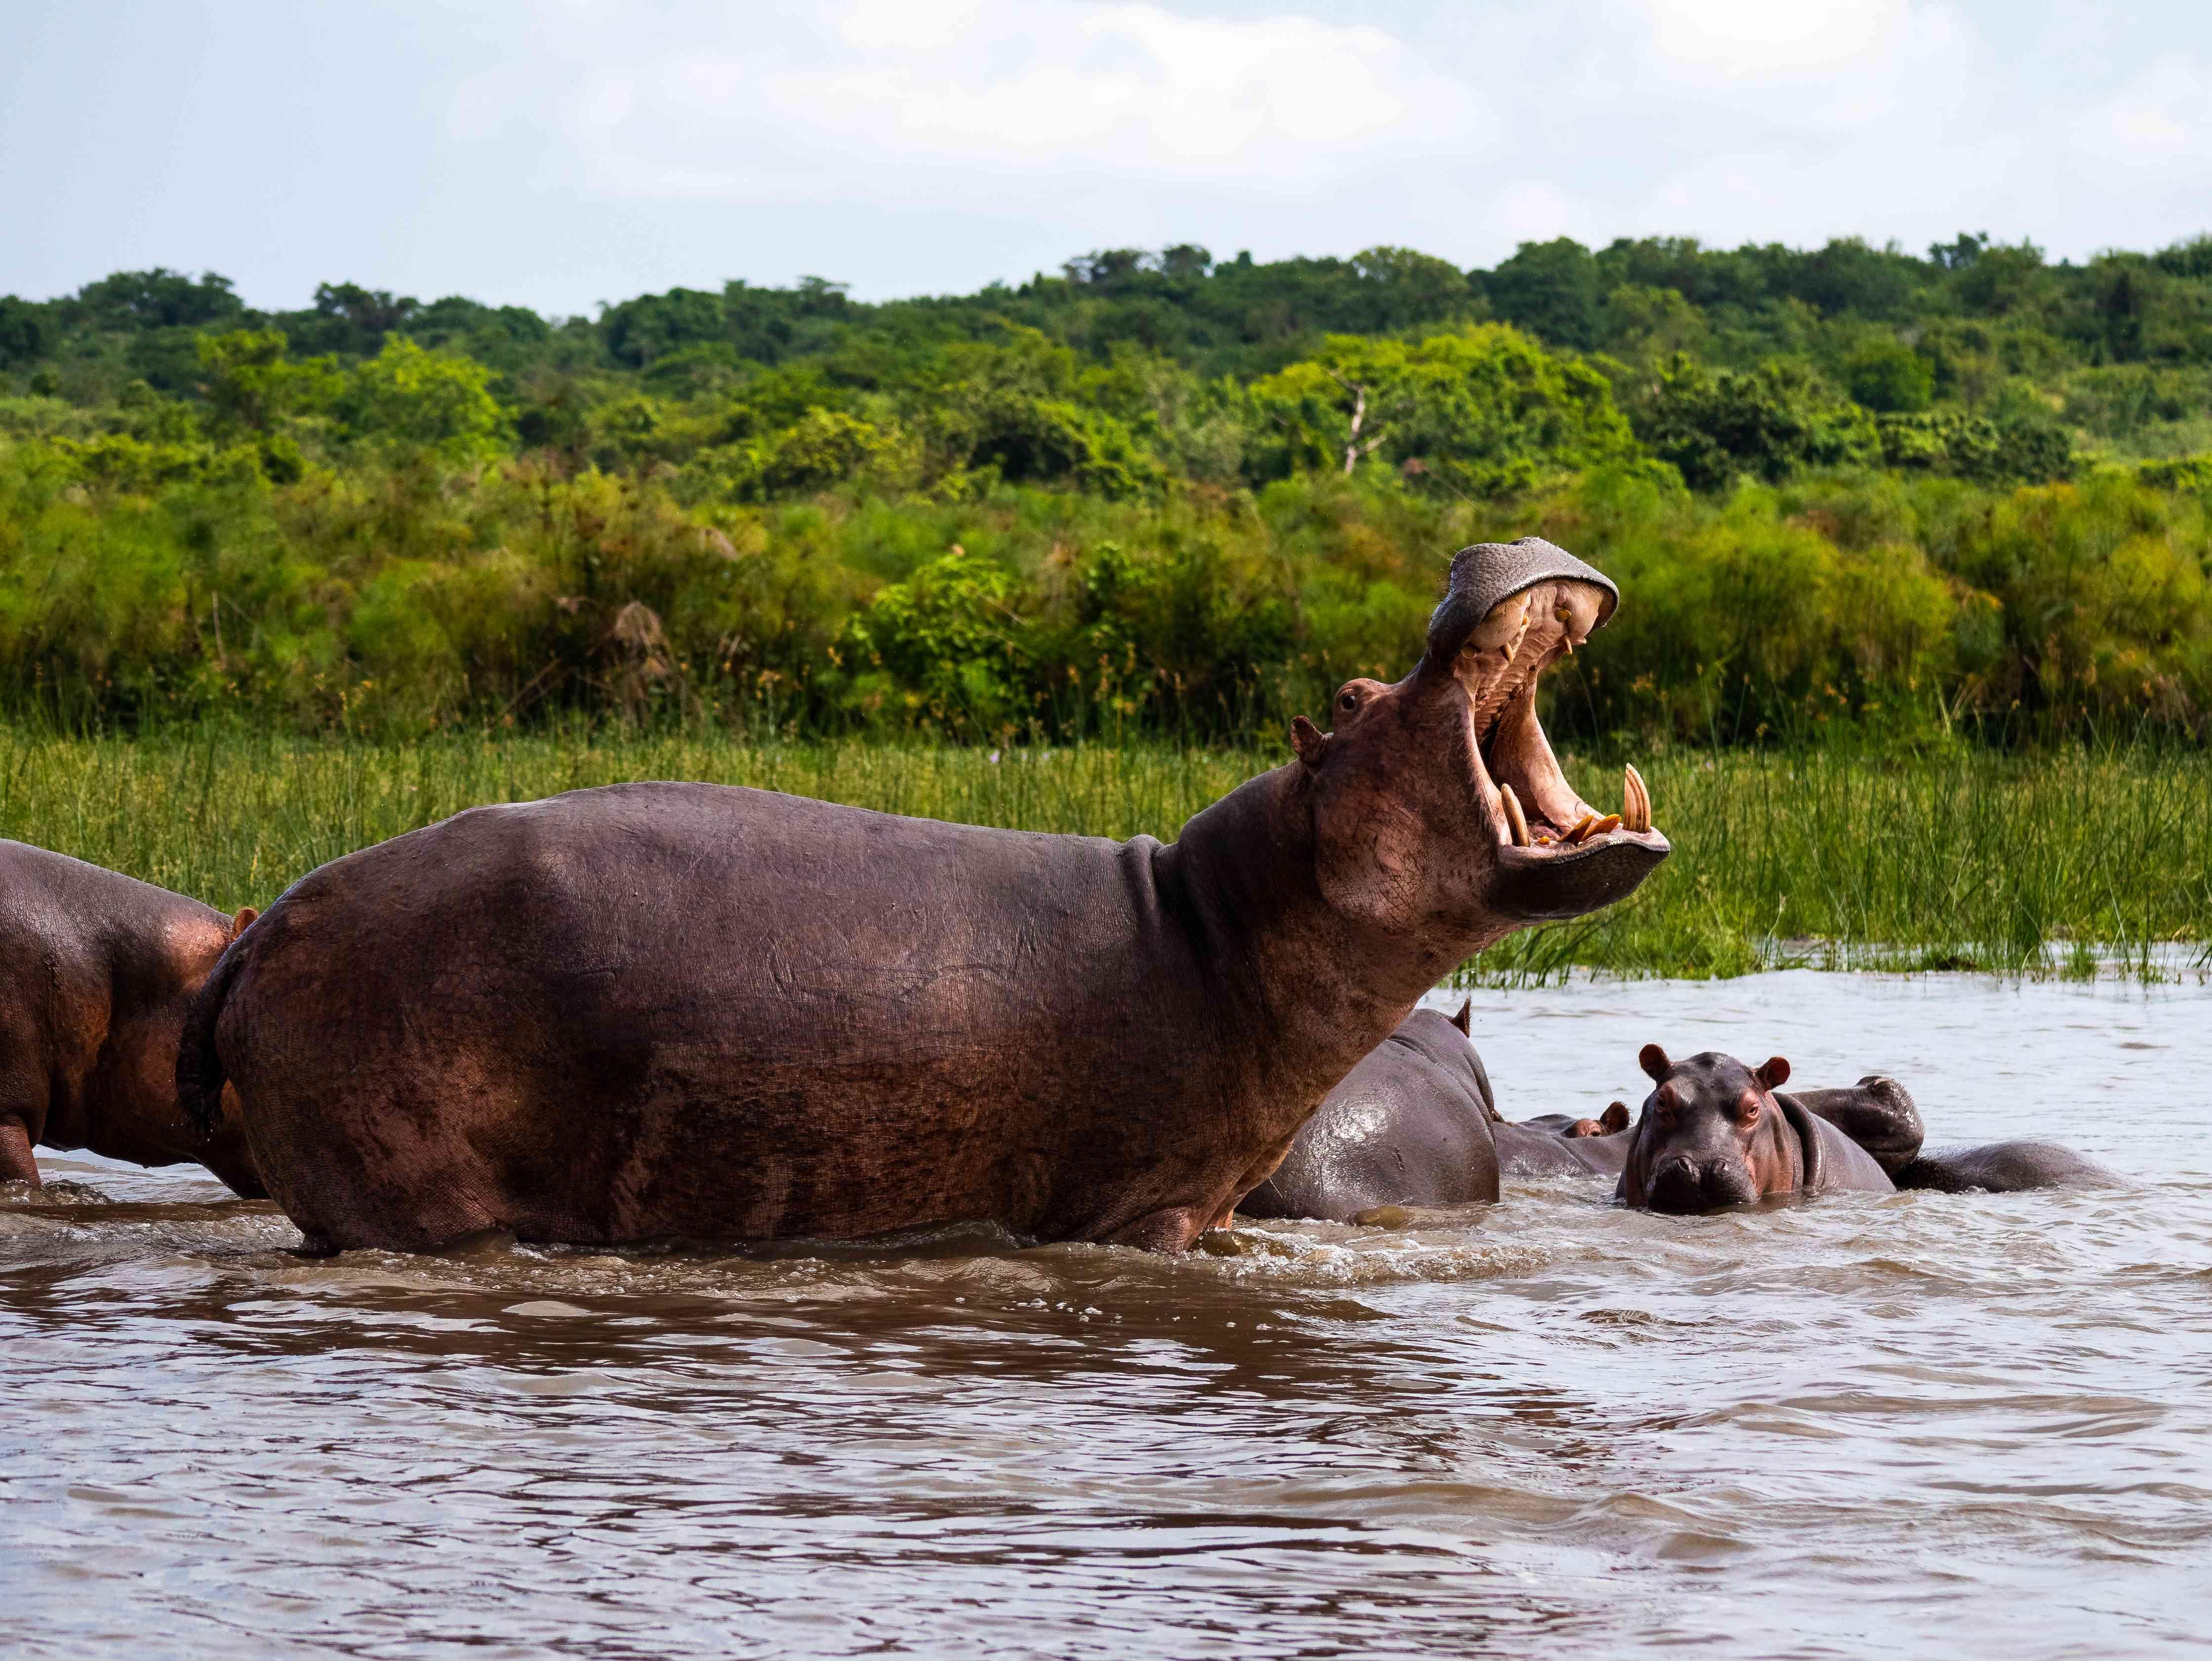 hippo yawning in the Nile River, Kenya